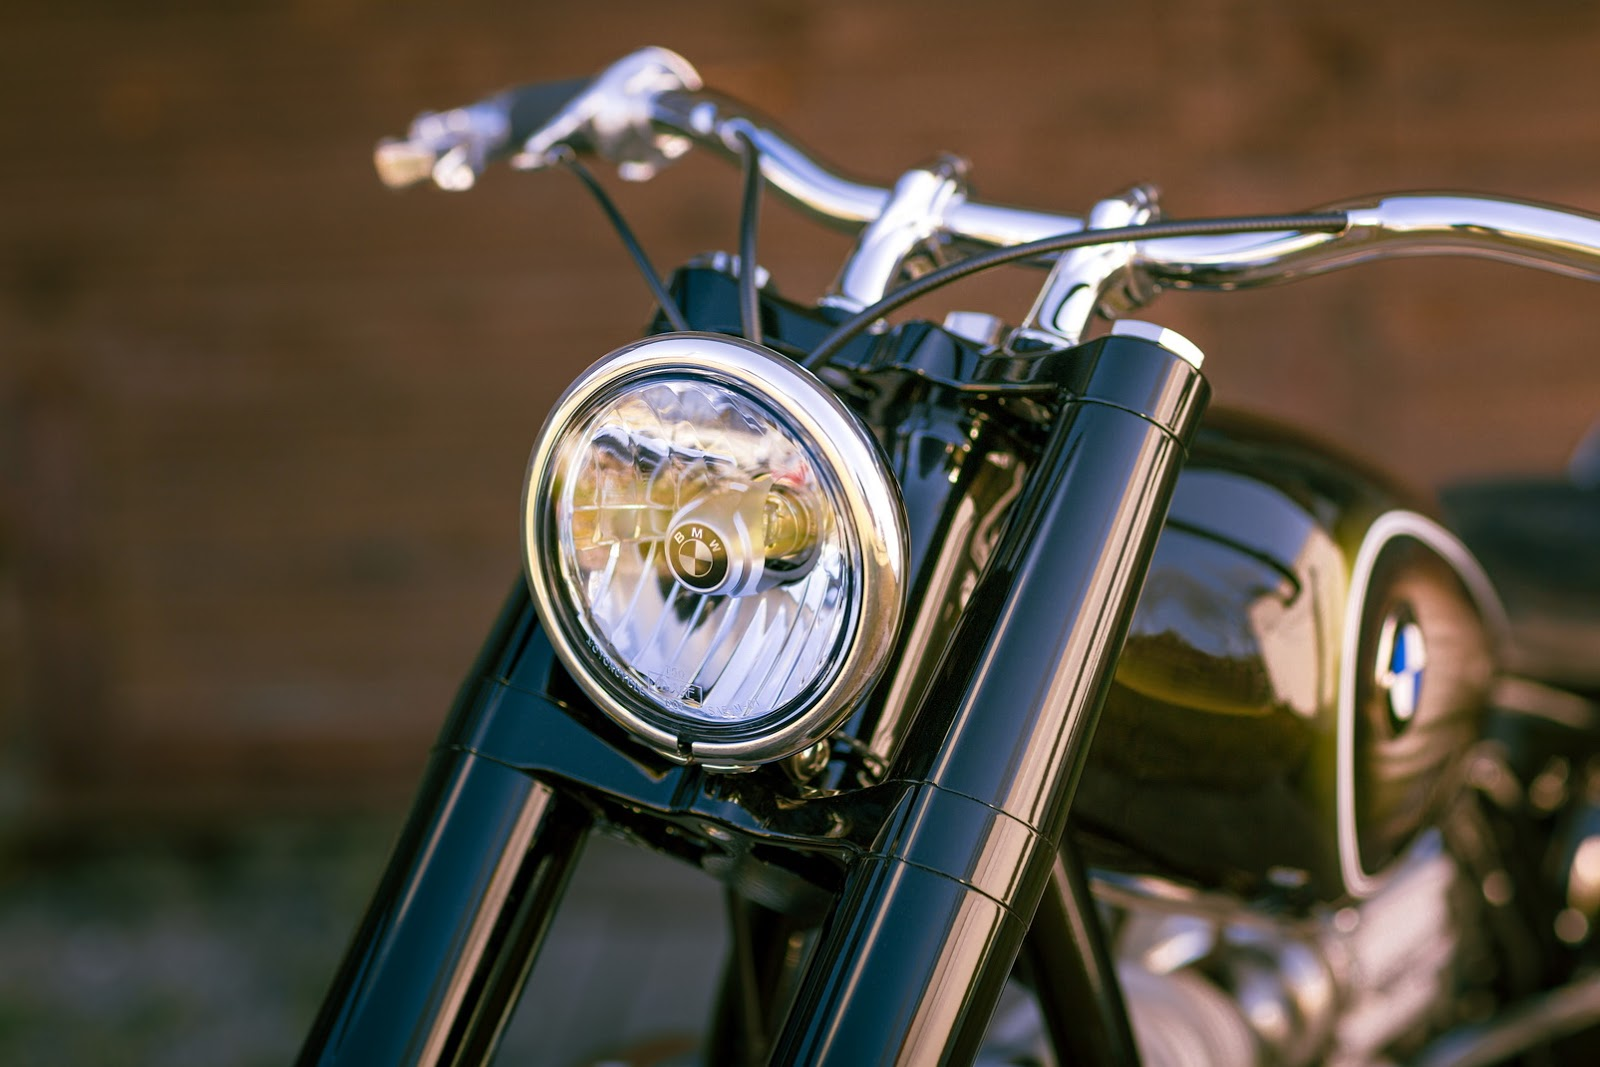 bmw-r5-hommage-bike-villa-deste-40-autonovosti.me-8